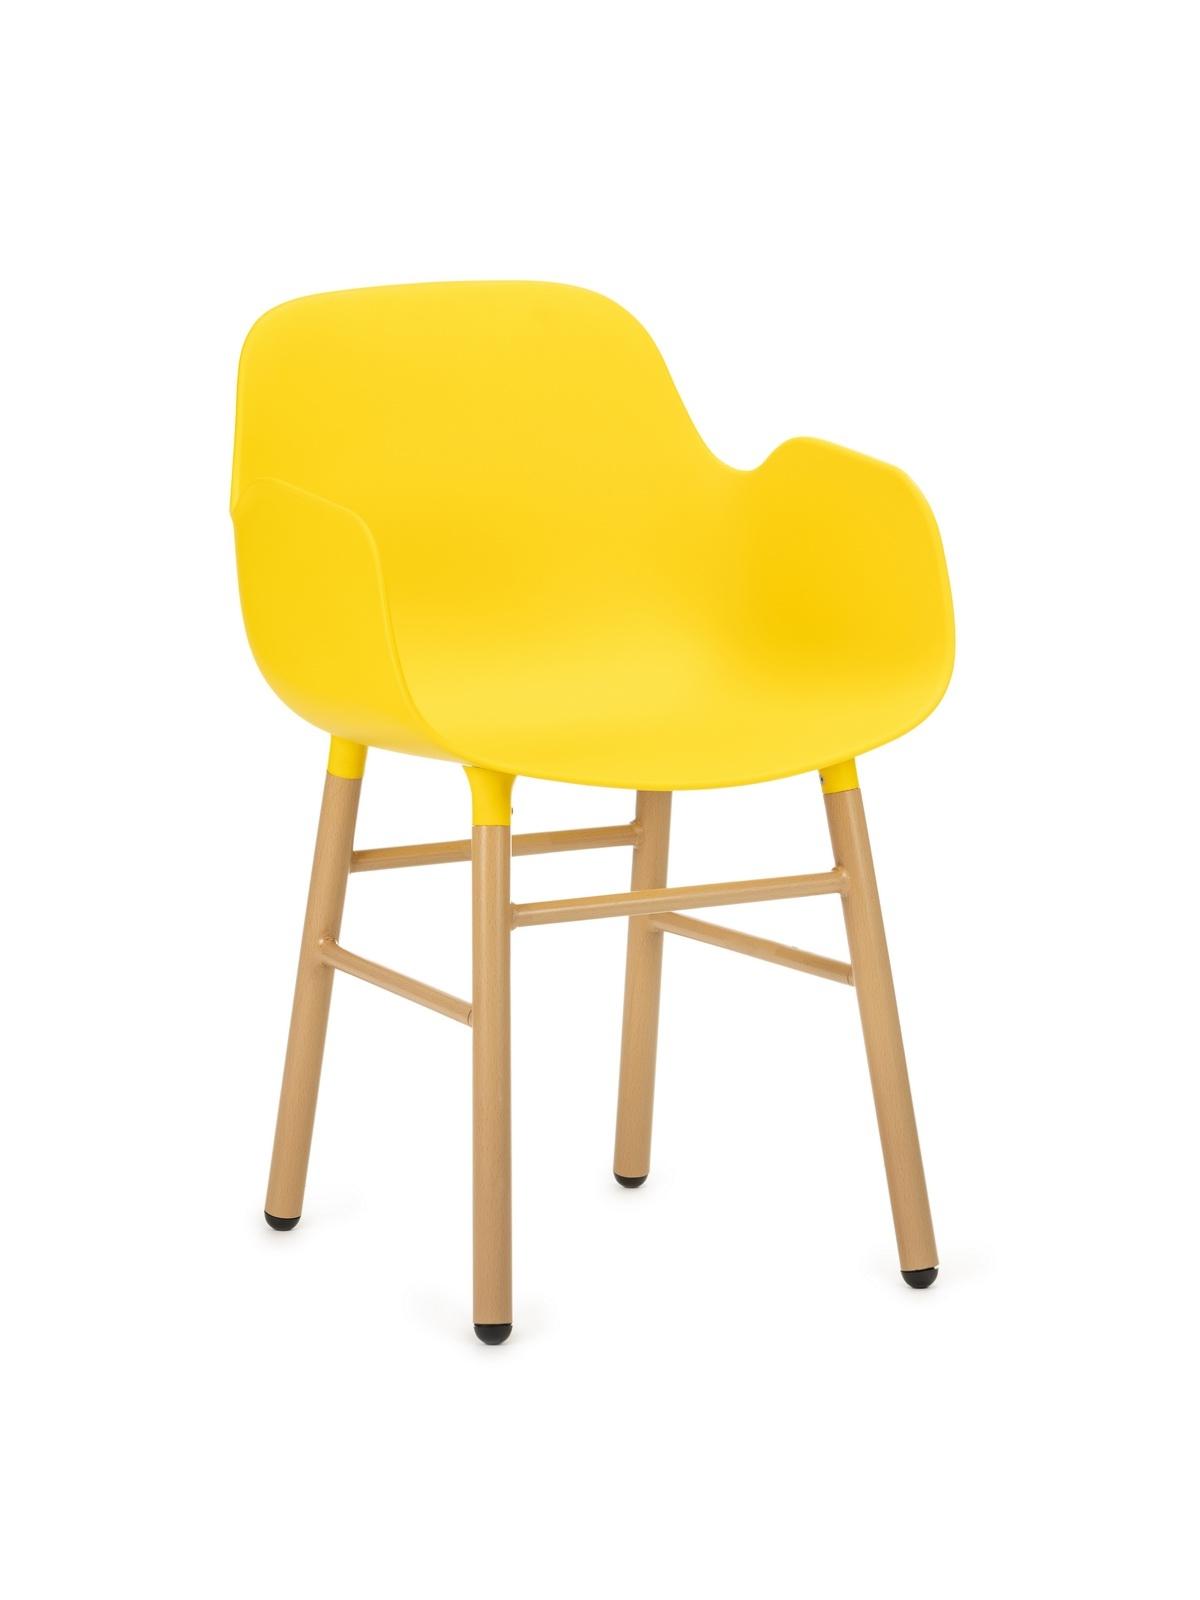 Scaun din plastic cu picioare metalice Wayne Yellow, l55xA56xH80 cm